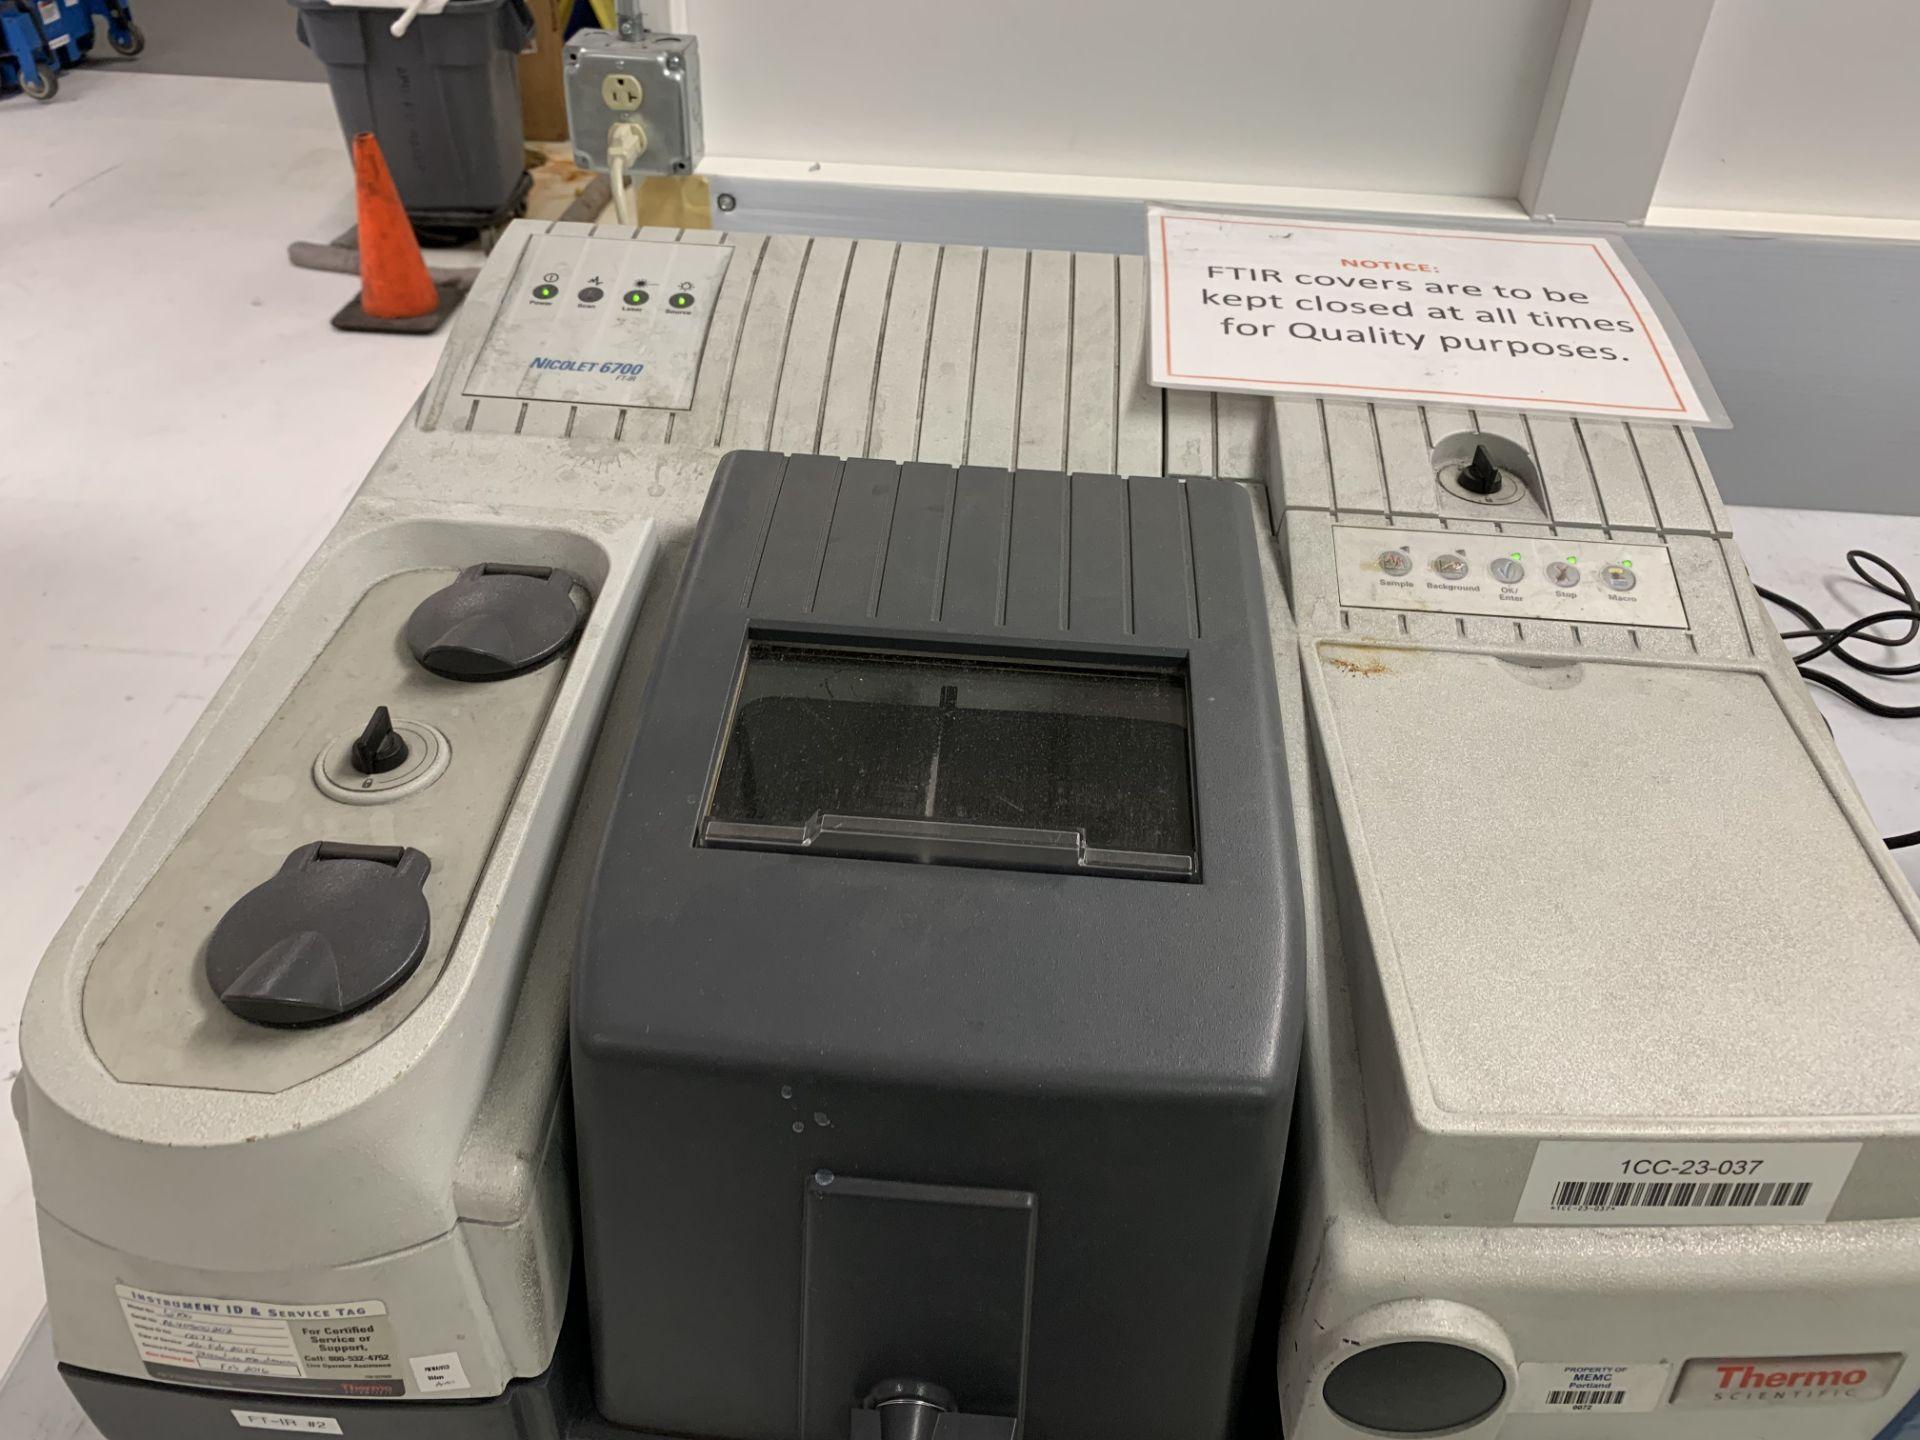 Lot 48 - Thermo Scientific Nicolet 6700 FT-IR Spectrometer